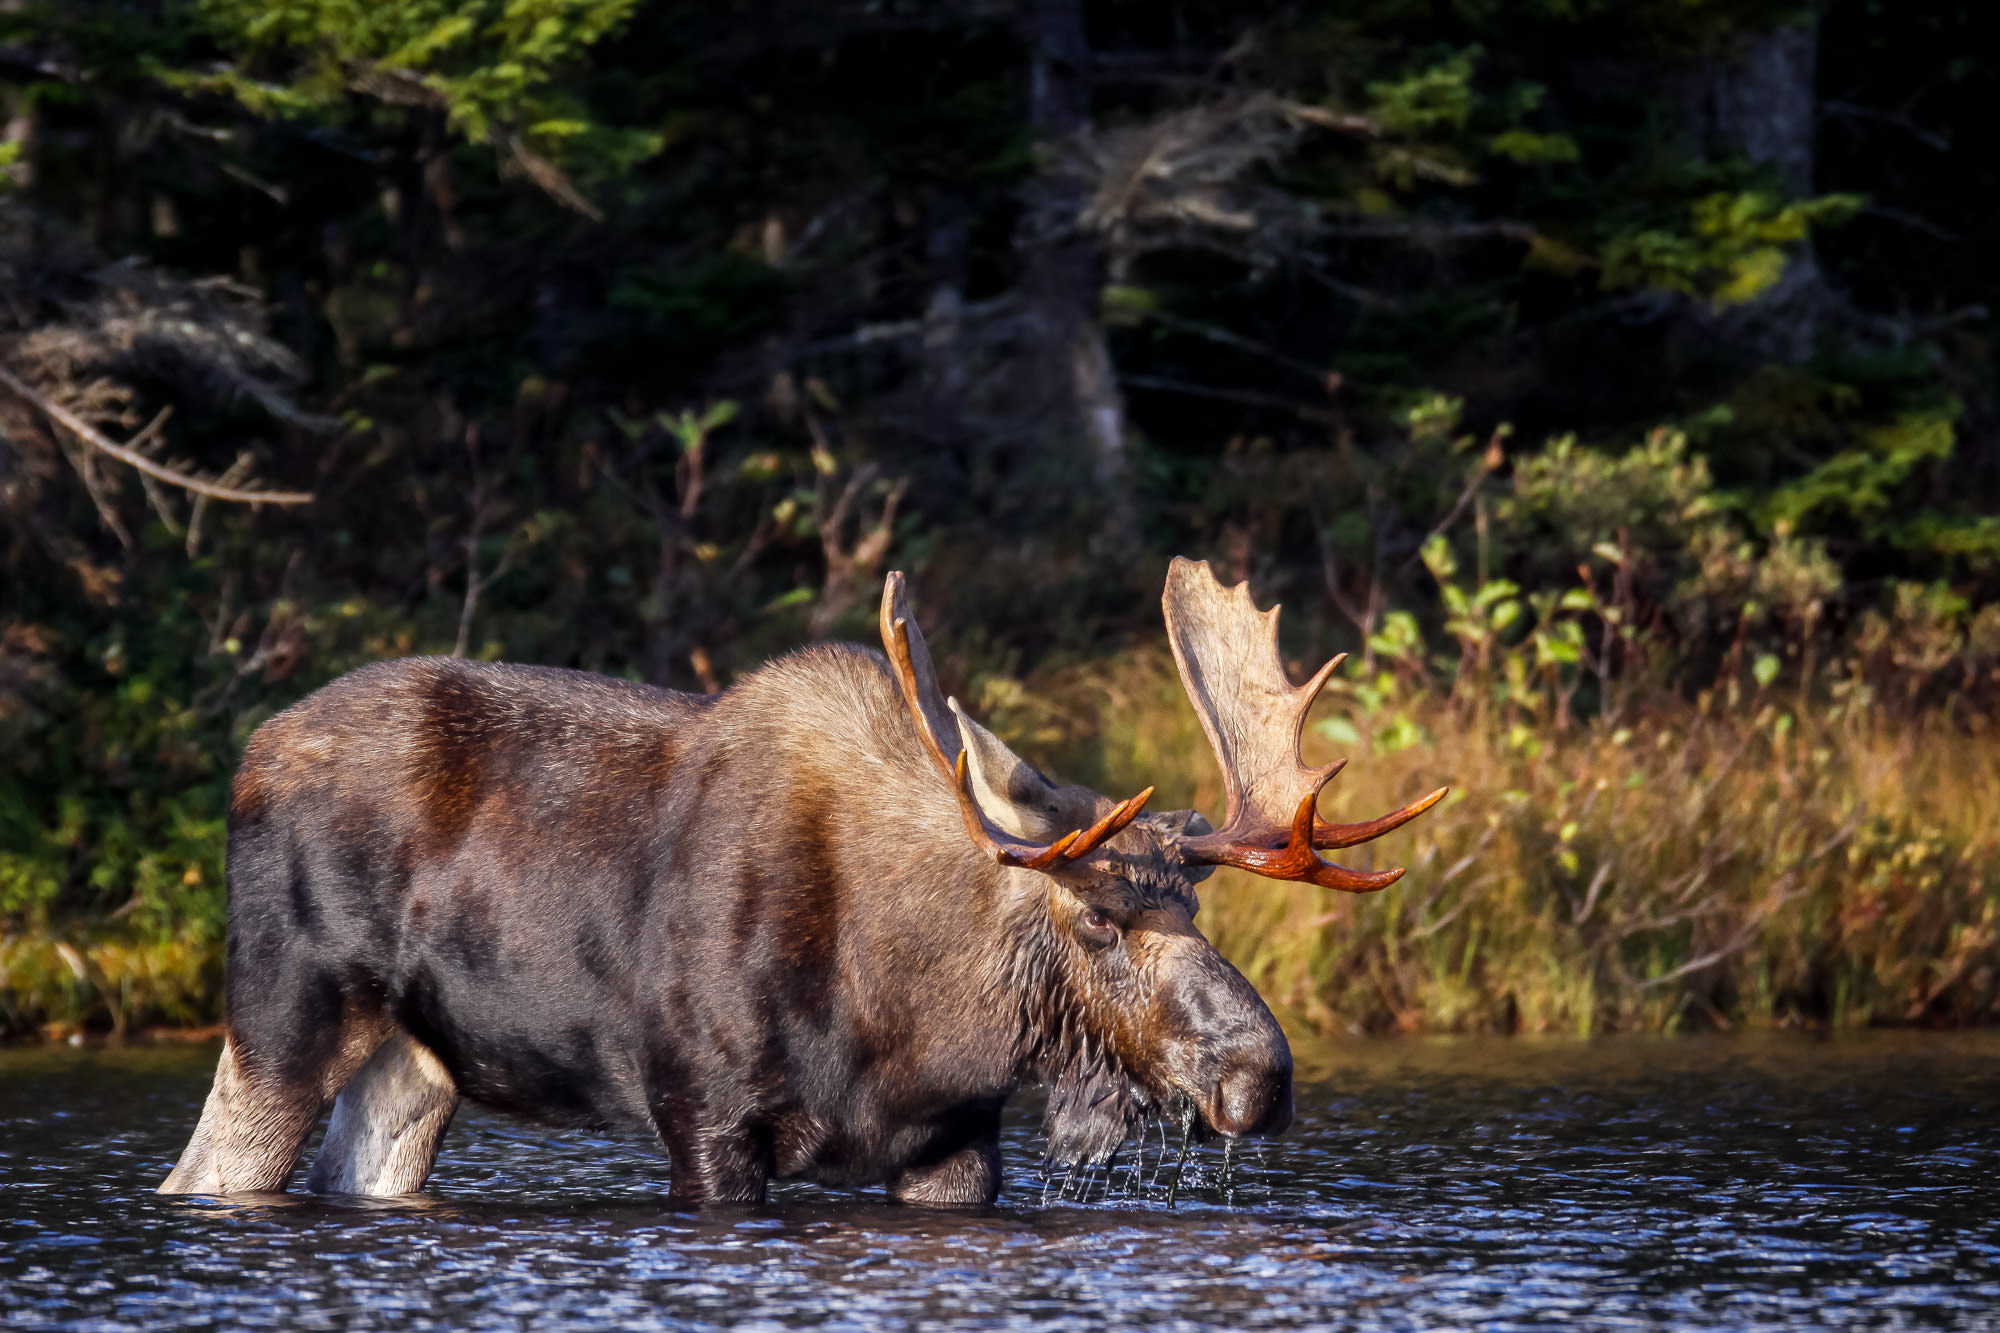 Moose, Bull Moose, Maine, Baxter, limited edition, photograph, fine art, wildlife, photo